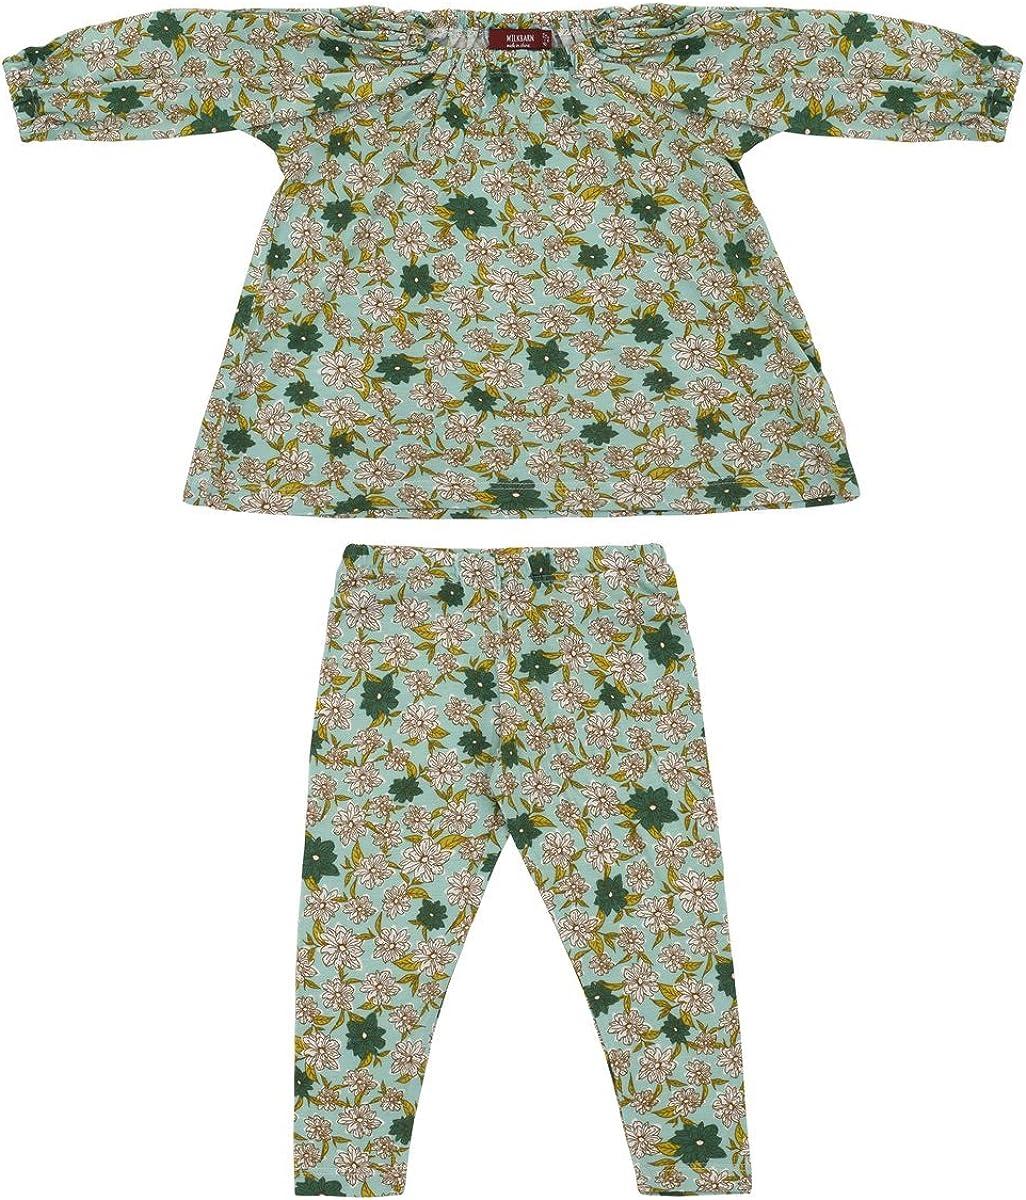 MilkBarn Infant and Toddler Bamboo Dress and Legging Set - Blue Floral